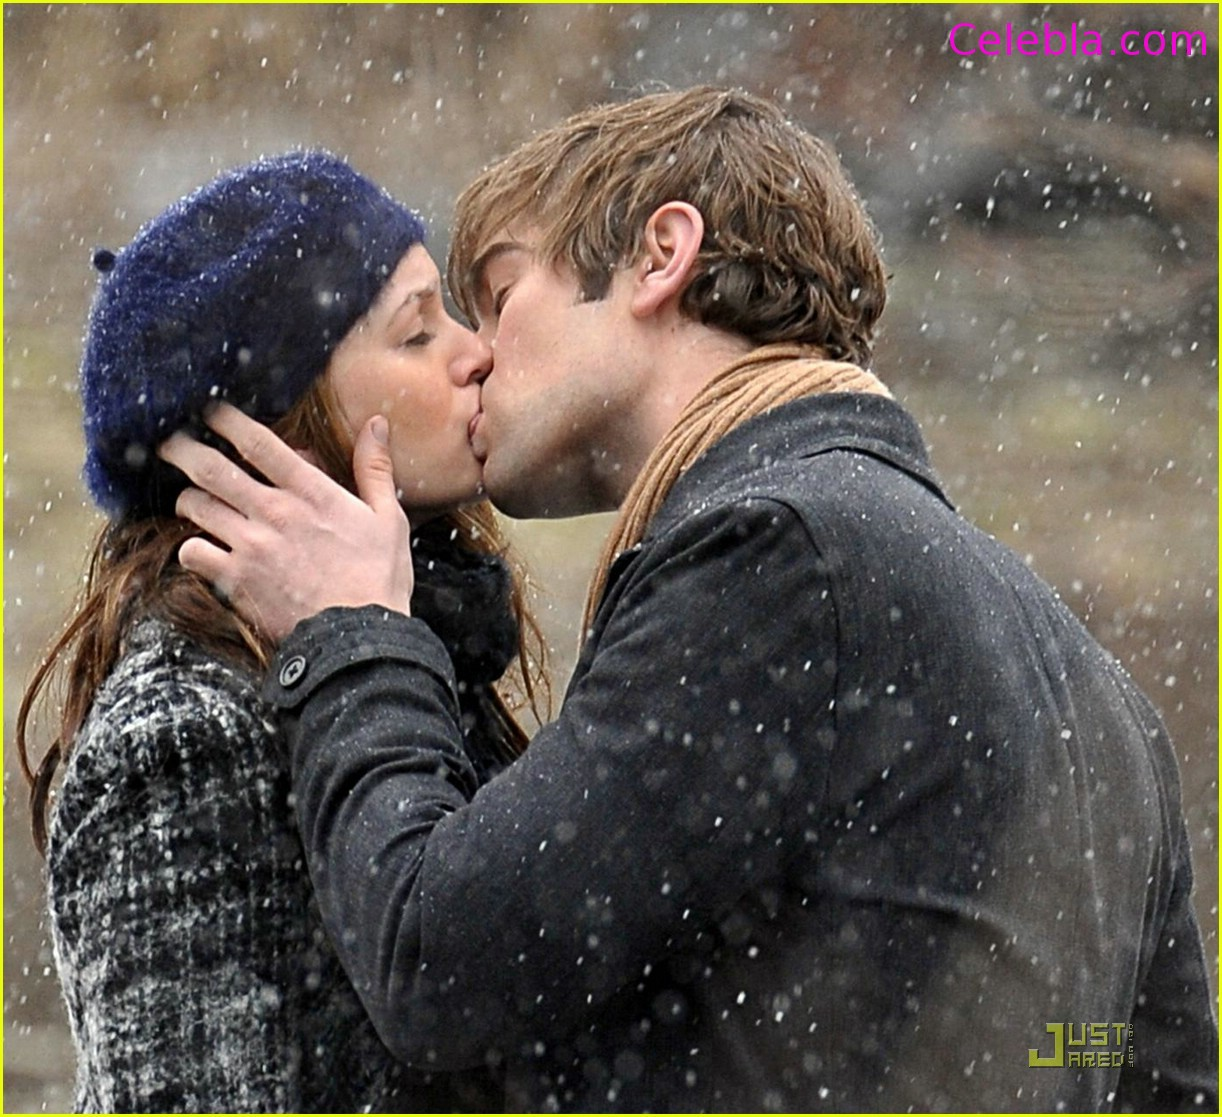 http://1.bp.blogspot.com/-fU8Bgqn0skI/UXrKNP3EygI/AAAAAAAACWU/bONH3T-yFUc/s1600/romantic-couple-kissing-wallpaper.jpg